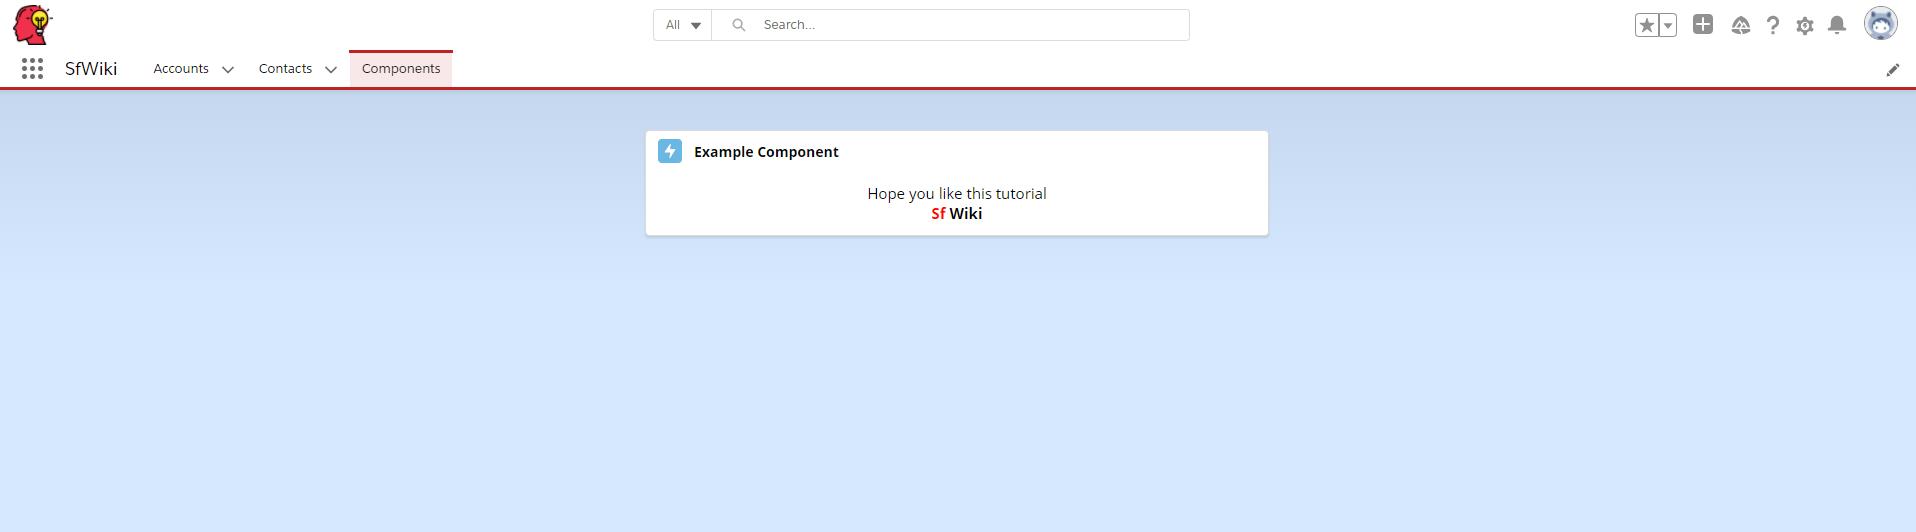 Remove Lightning App Page Header